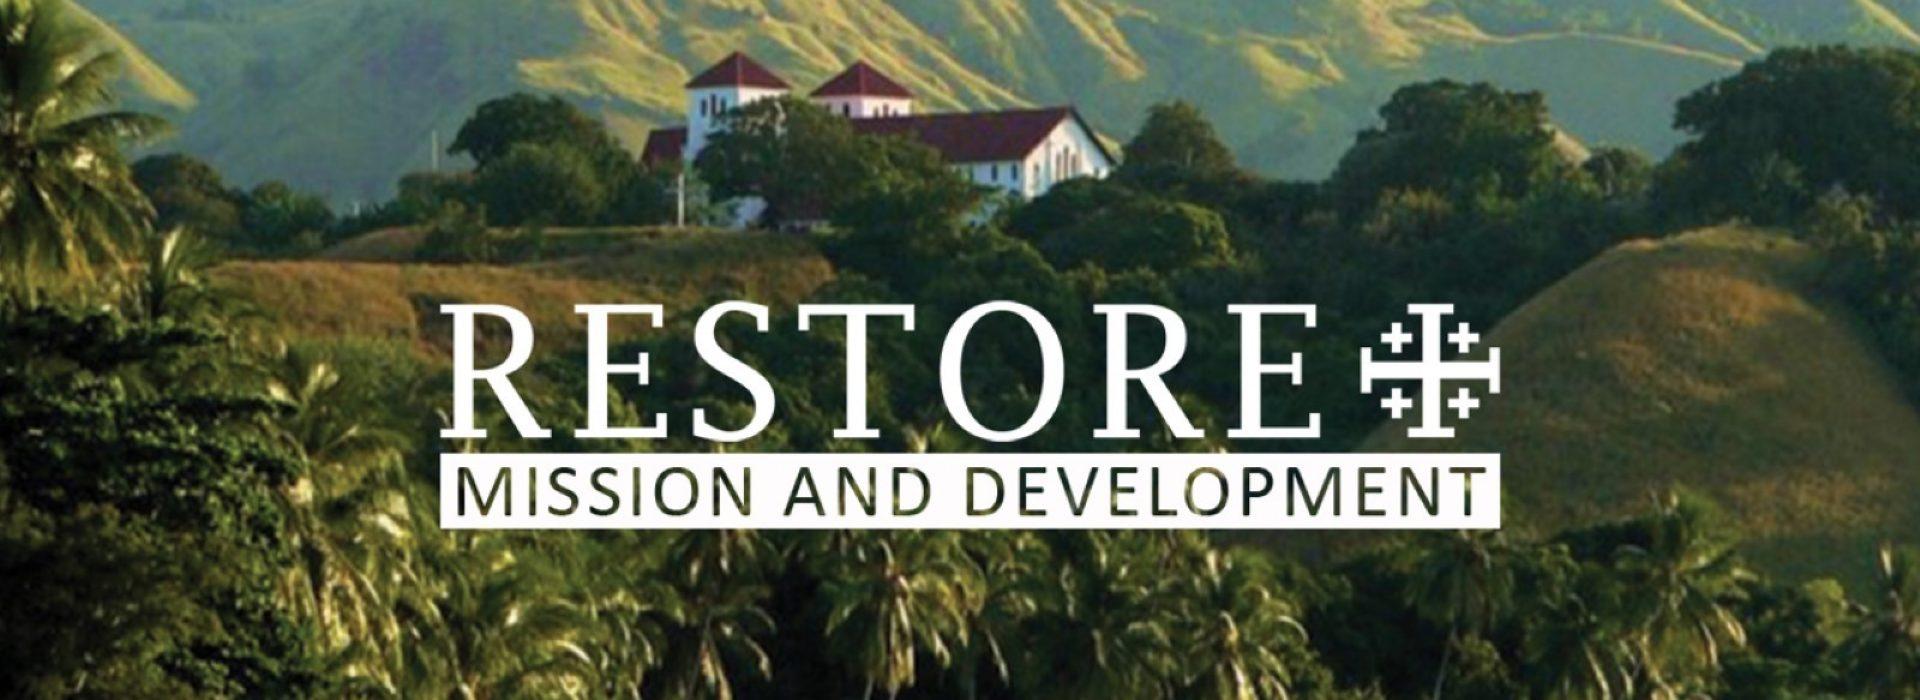 Restore Mission